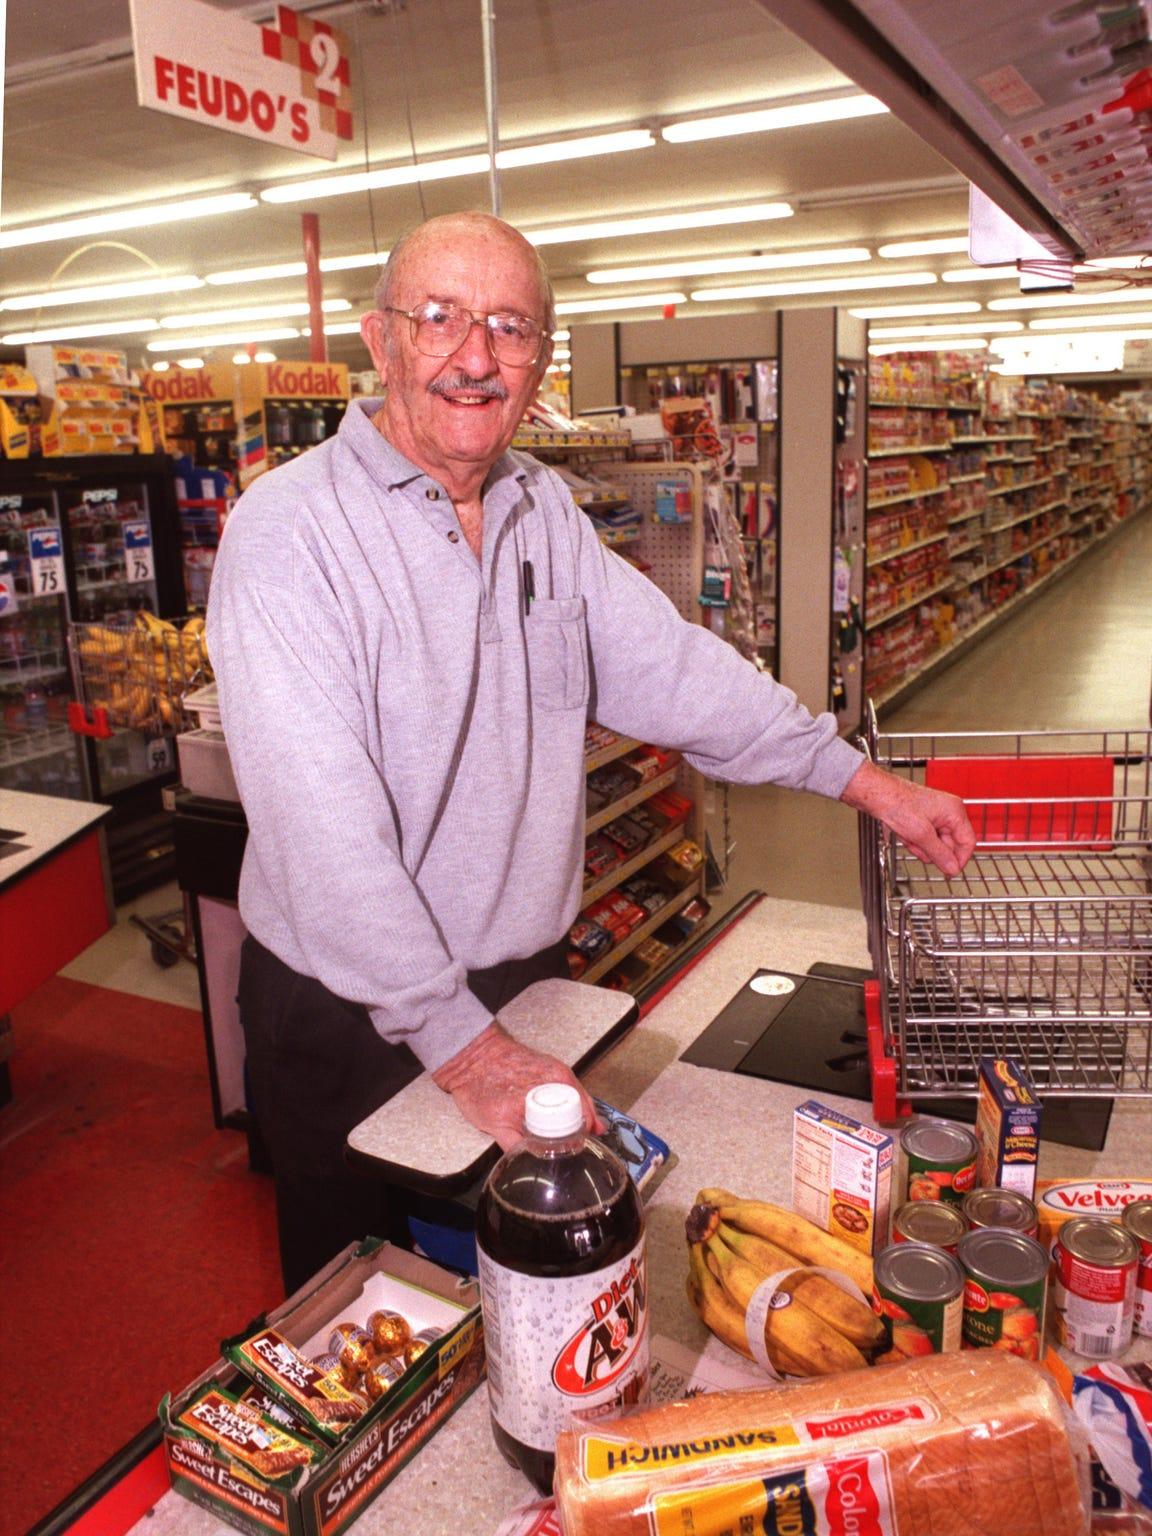 Joe Feudo, original owner of the Feudo's Food stores,